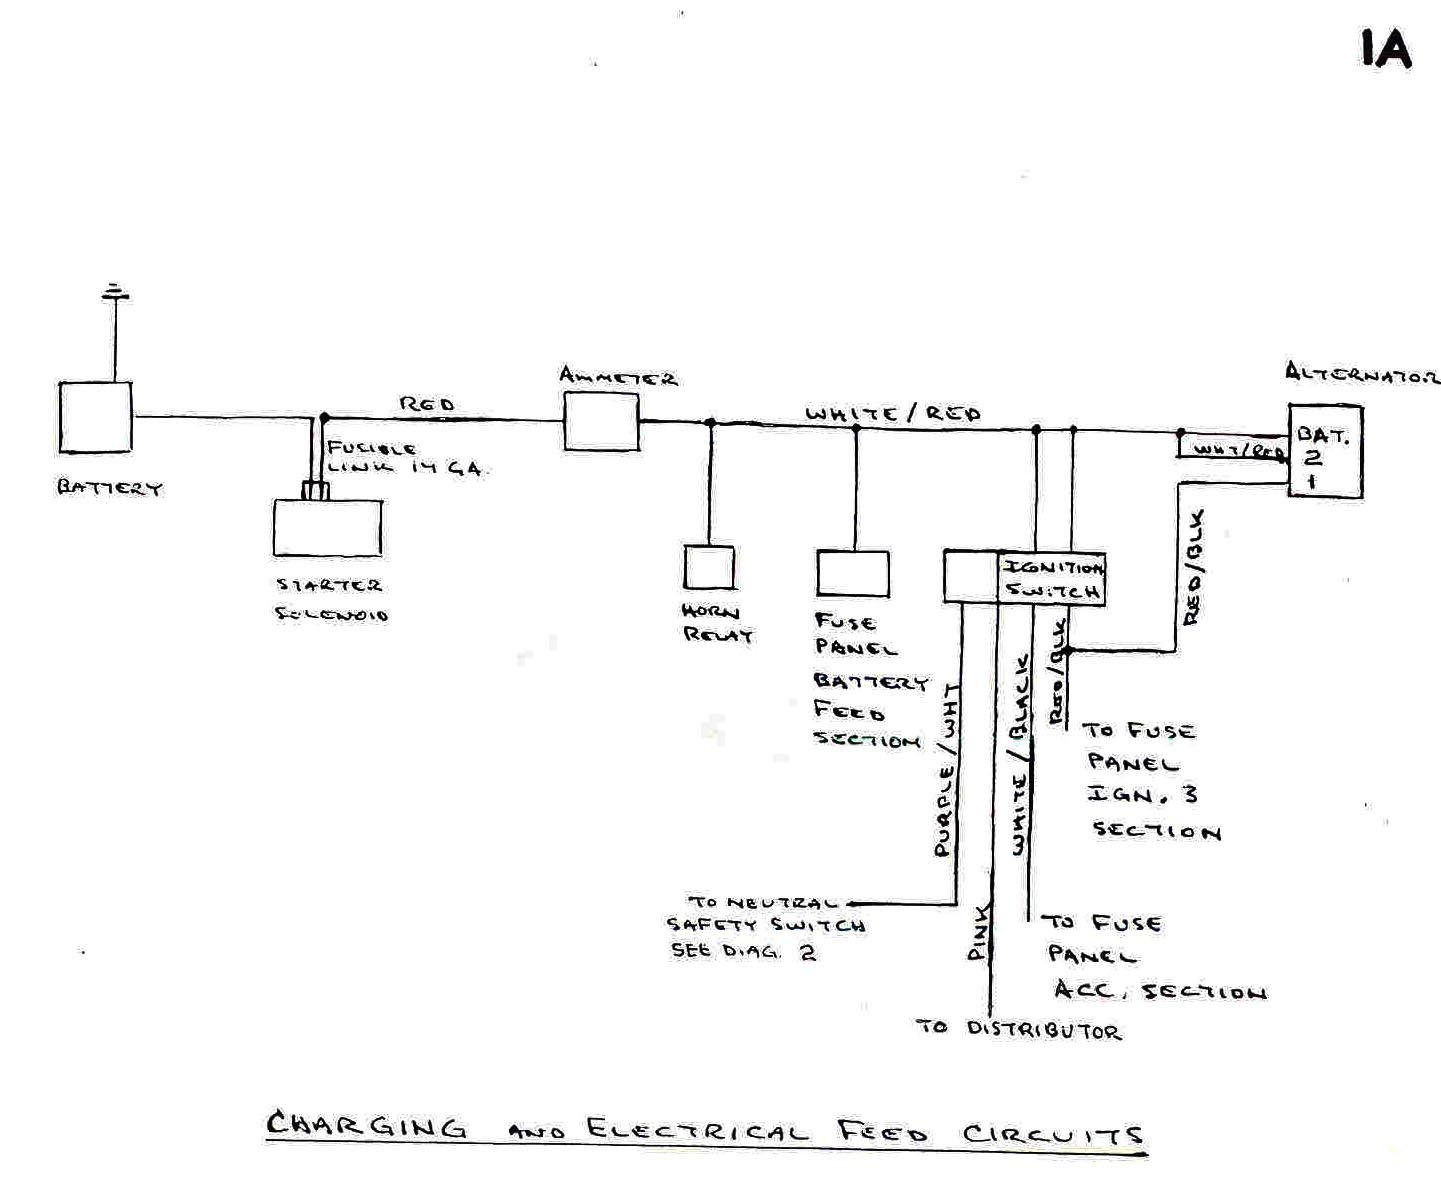 Studebaker Avanti Wire Diagram On 1960 Studebaker Lark Wiring Diagram